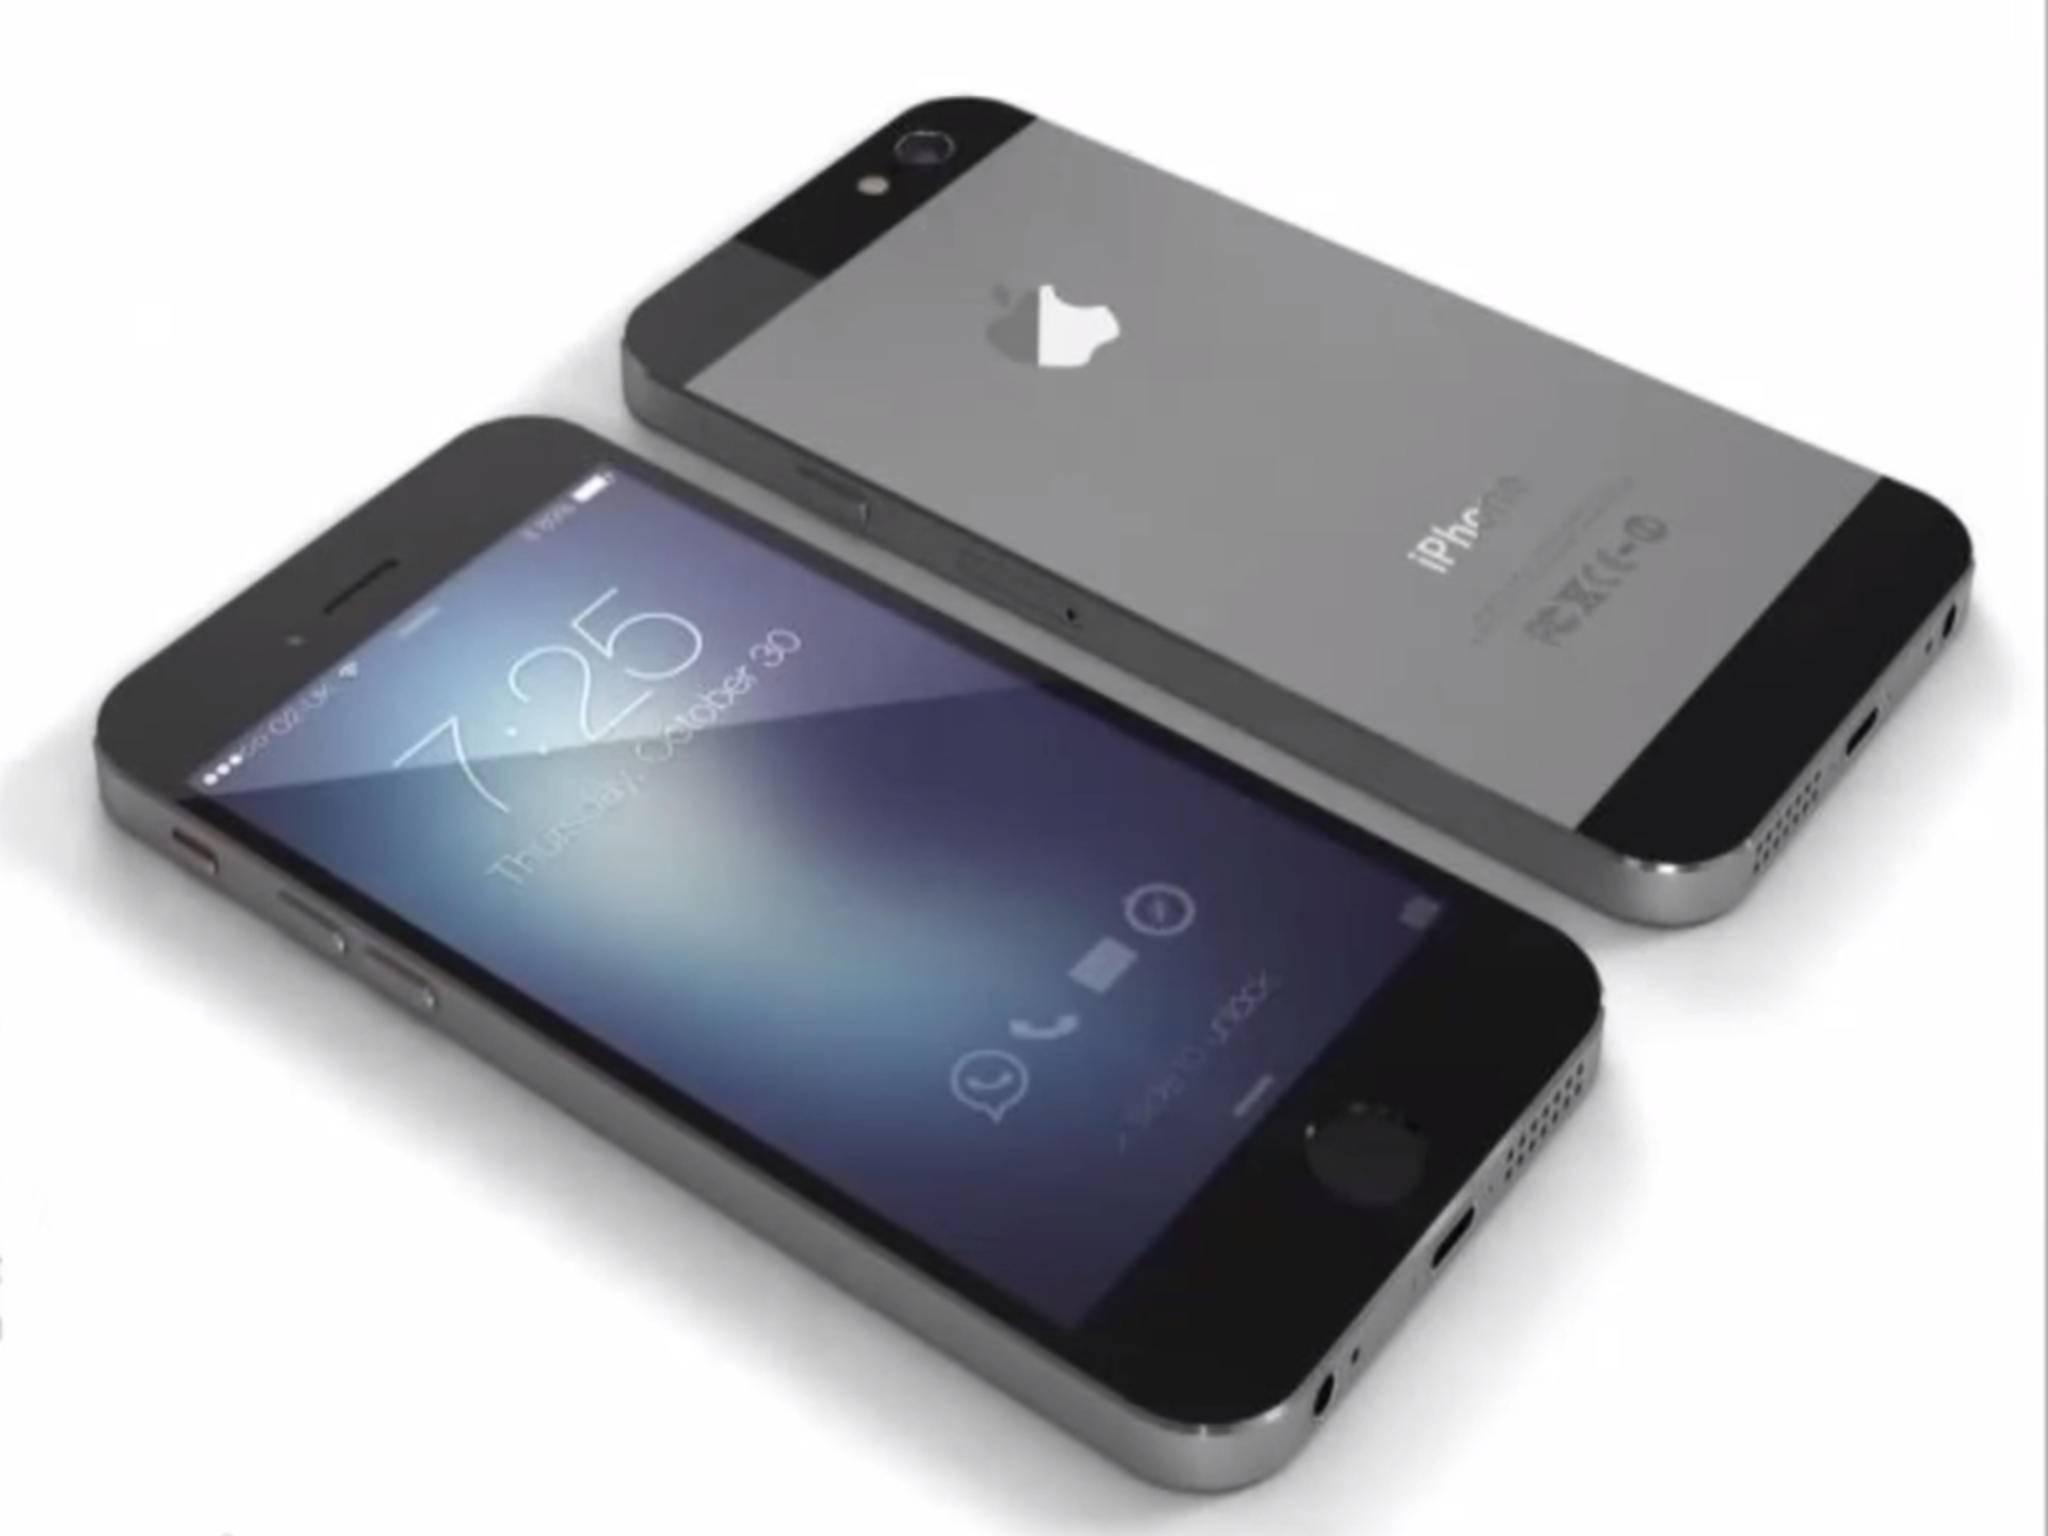 Zum Design des iPhone 6s existieren bislang nur inoffizielle Konzeptstudien.